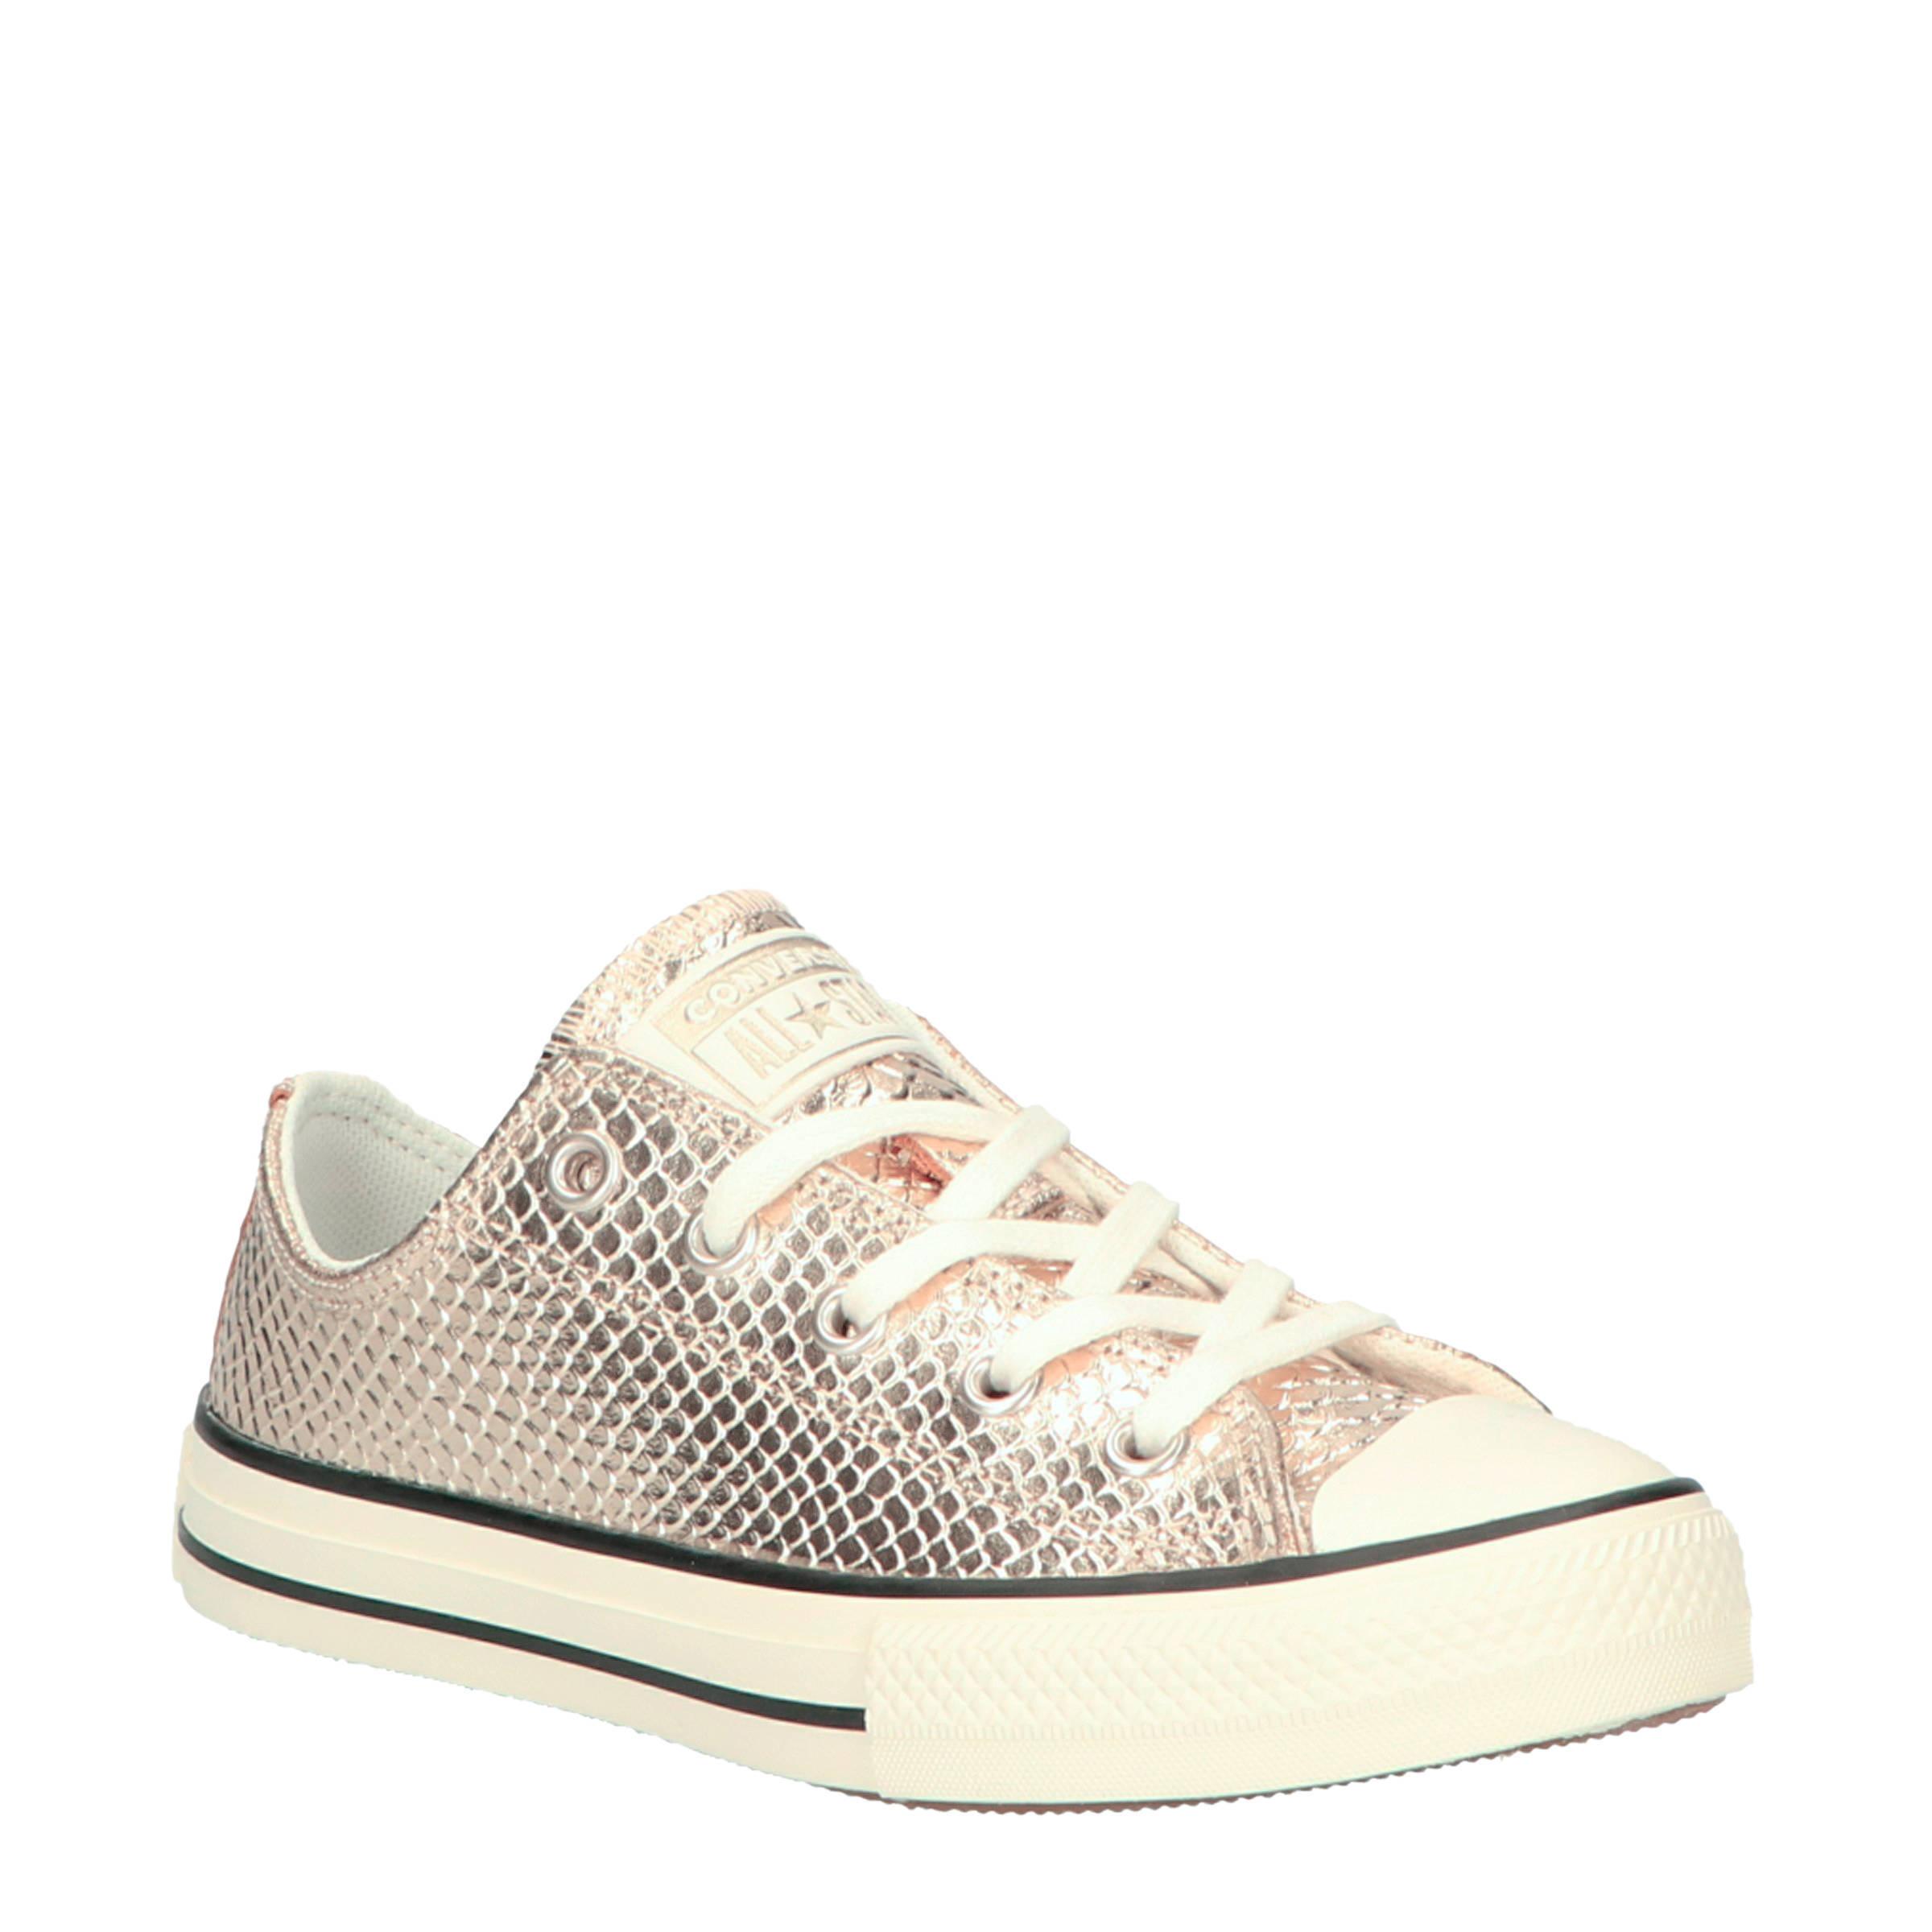 Converse Chuck Taylor All Star OX leren sneakers goud | wehkamp